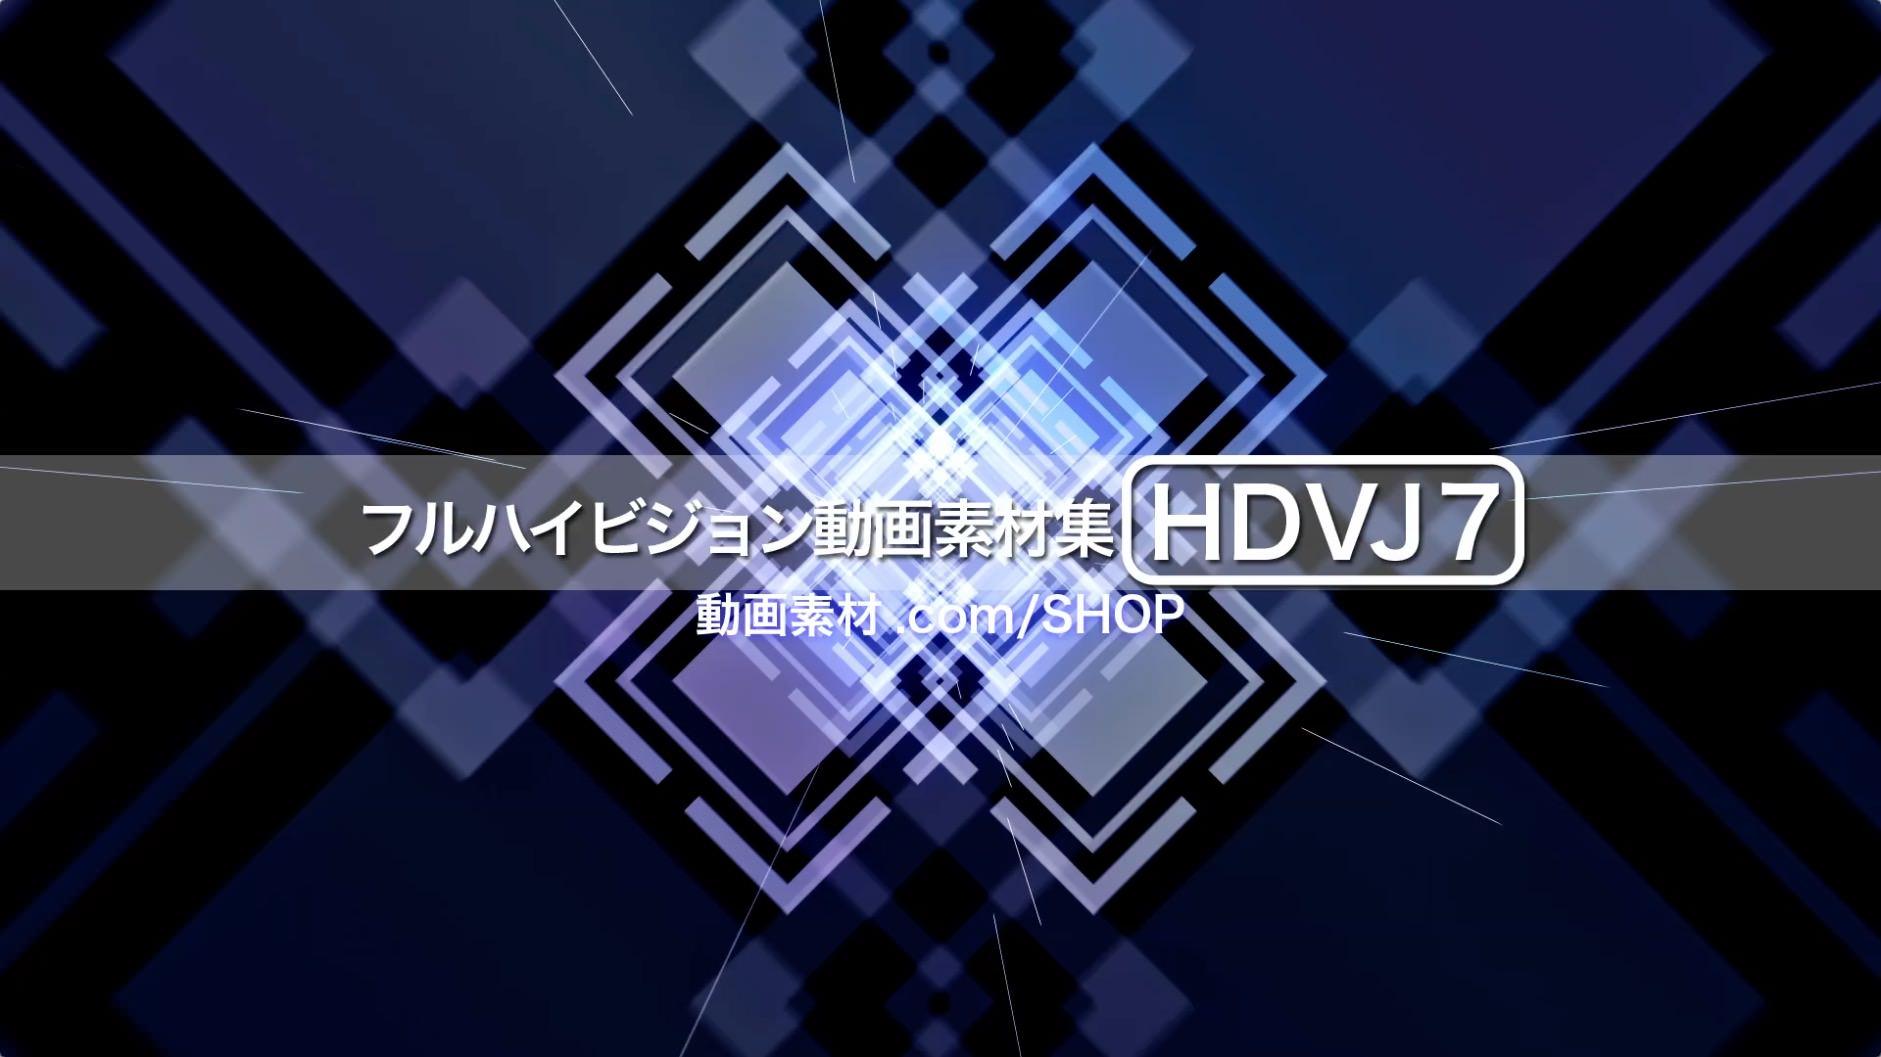 MovieMaterial HDVJ7 フルハイビジョンVJ動画素材集 画像2